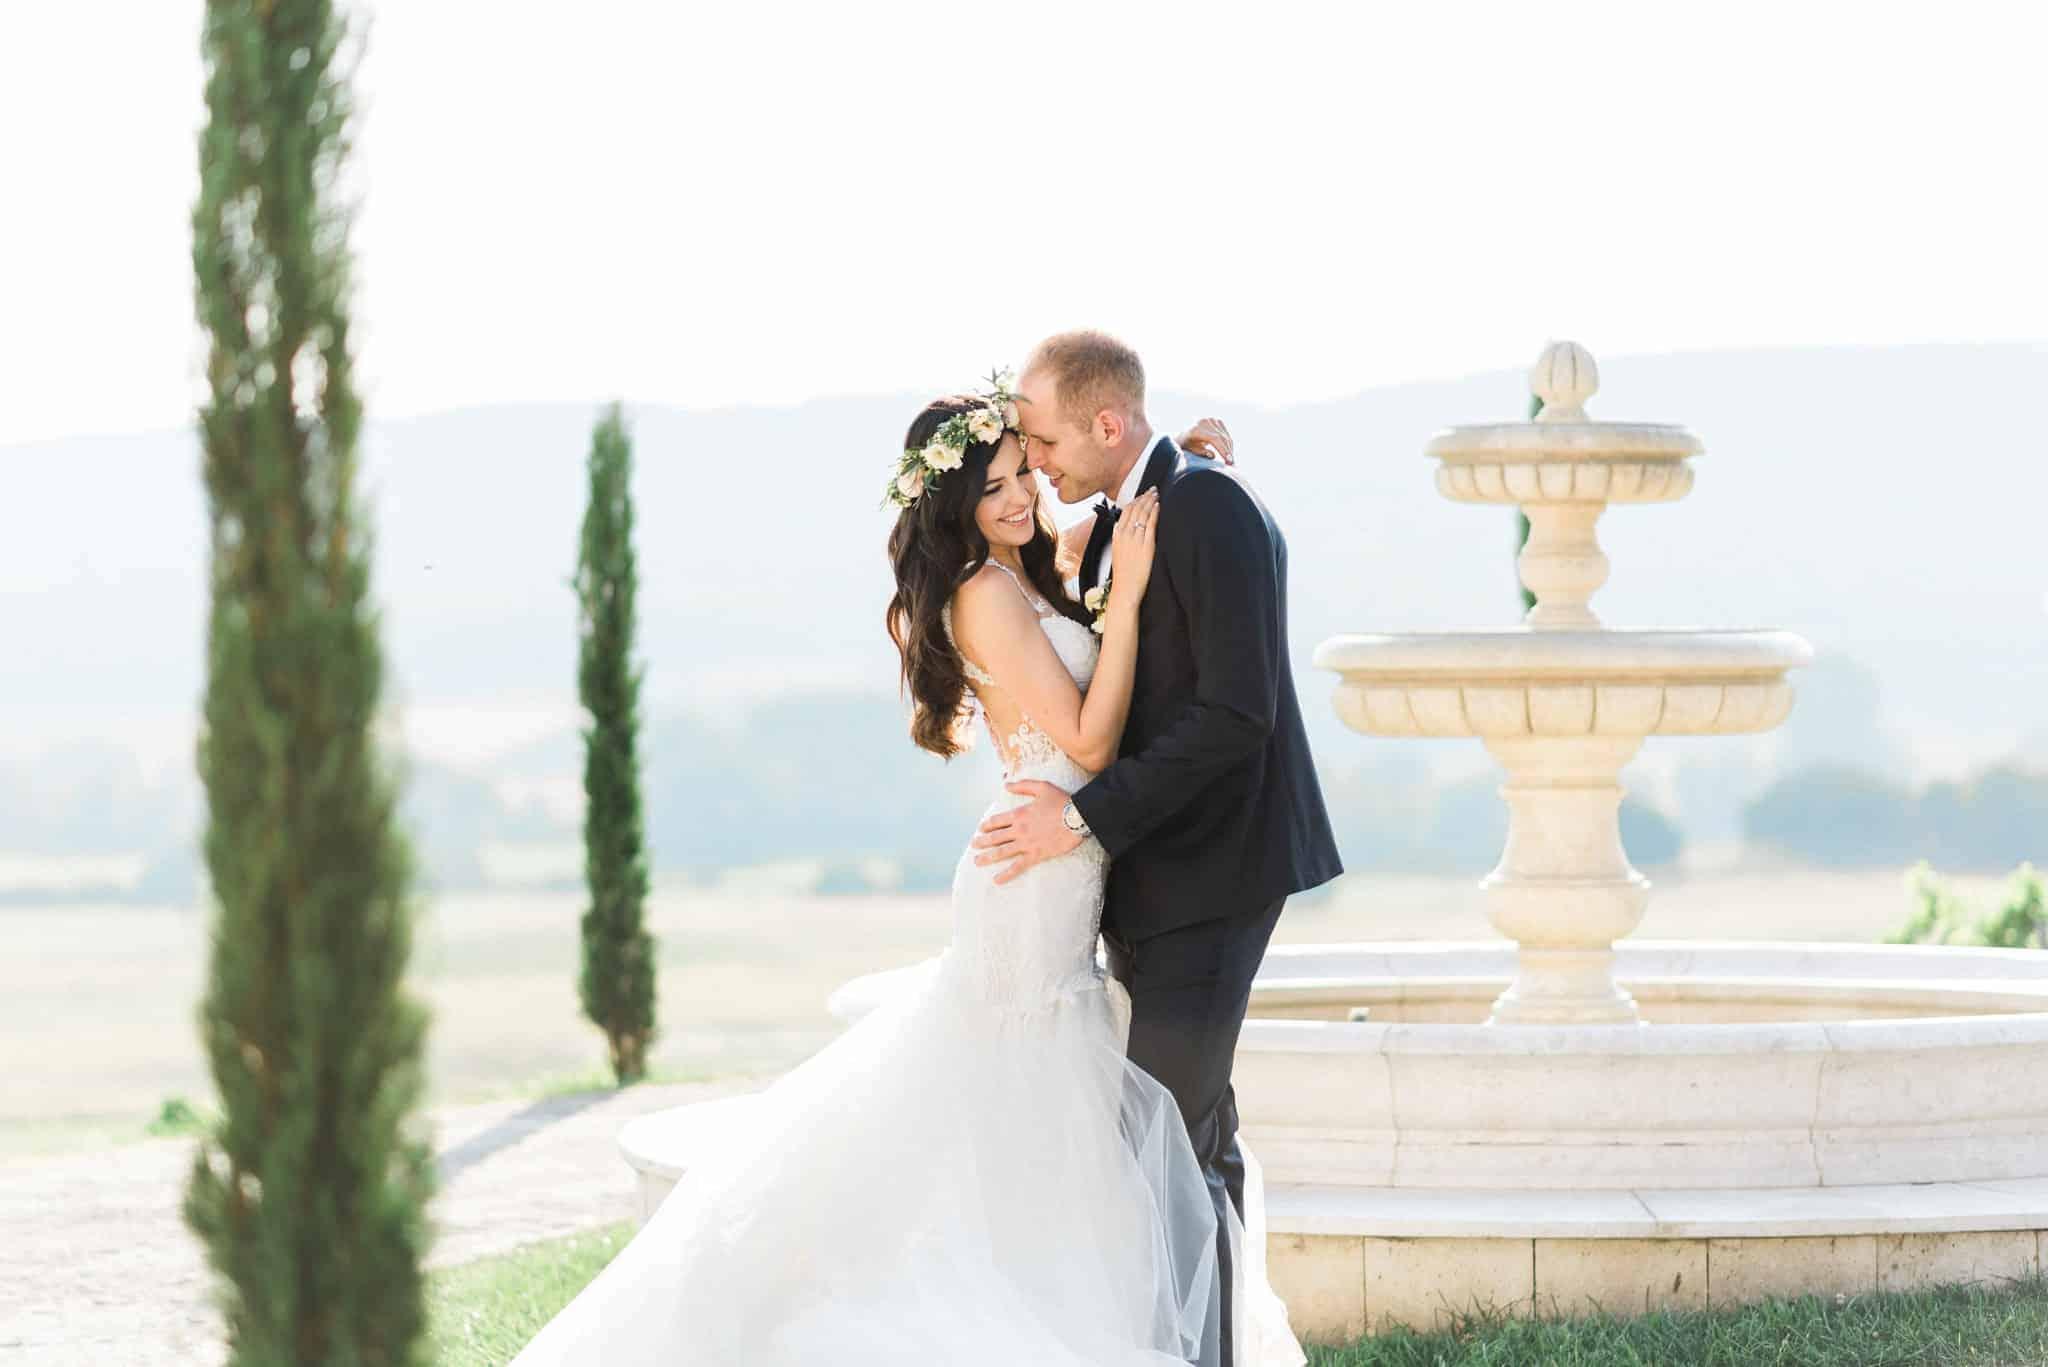 Wedoverhills_Prewedding_Wedding_Photographer_Provance_0022